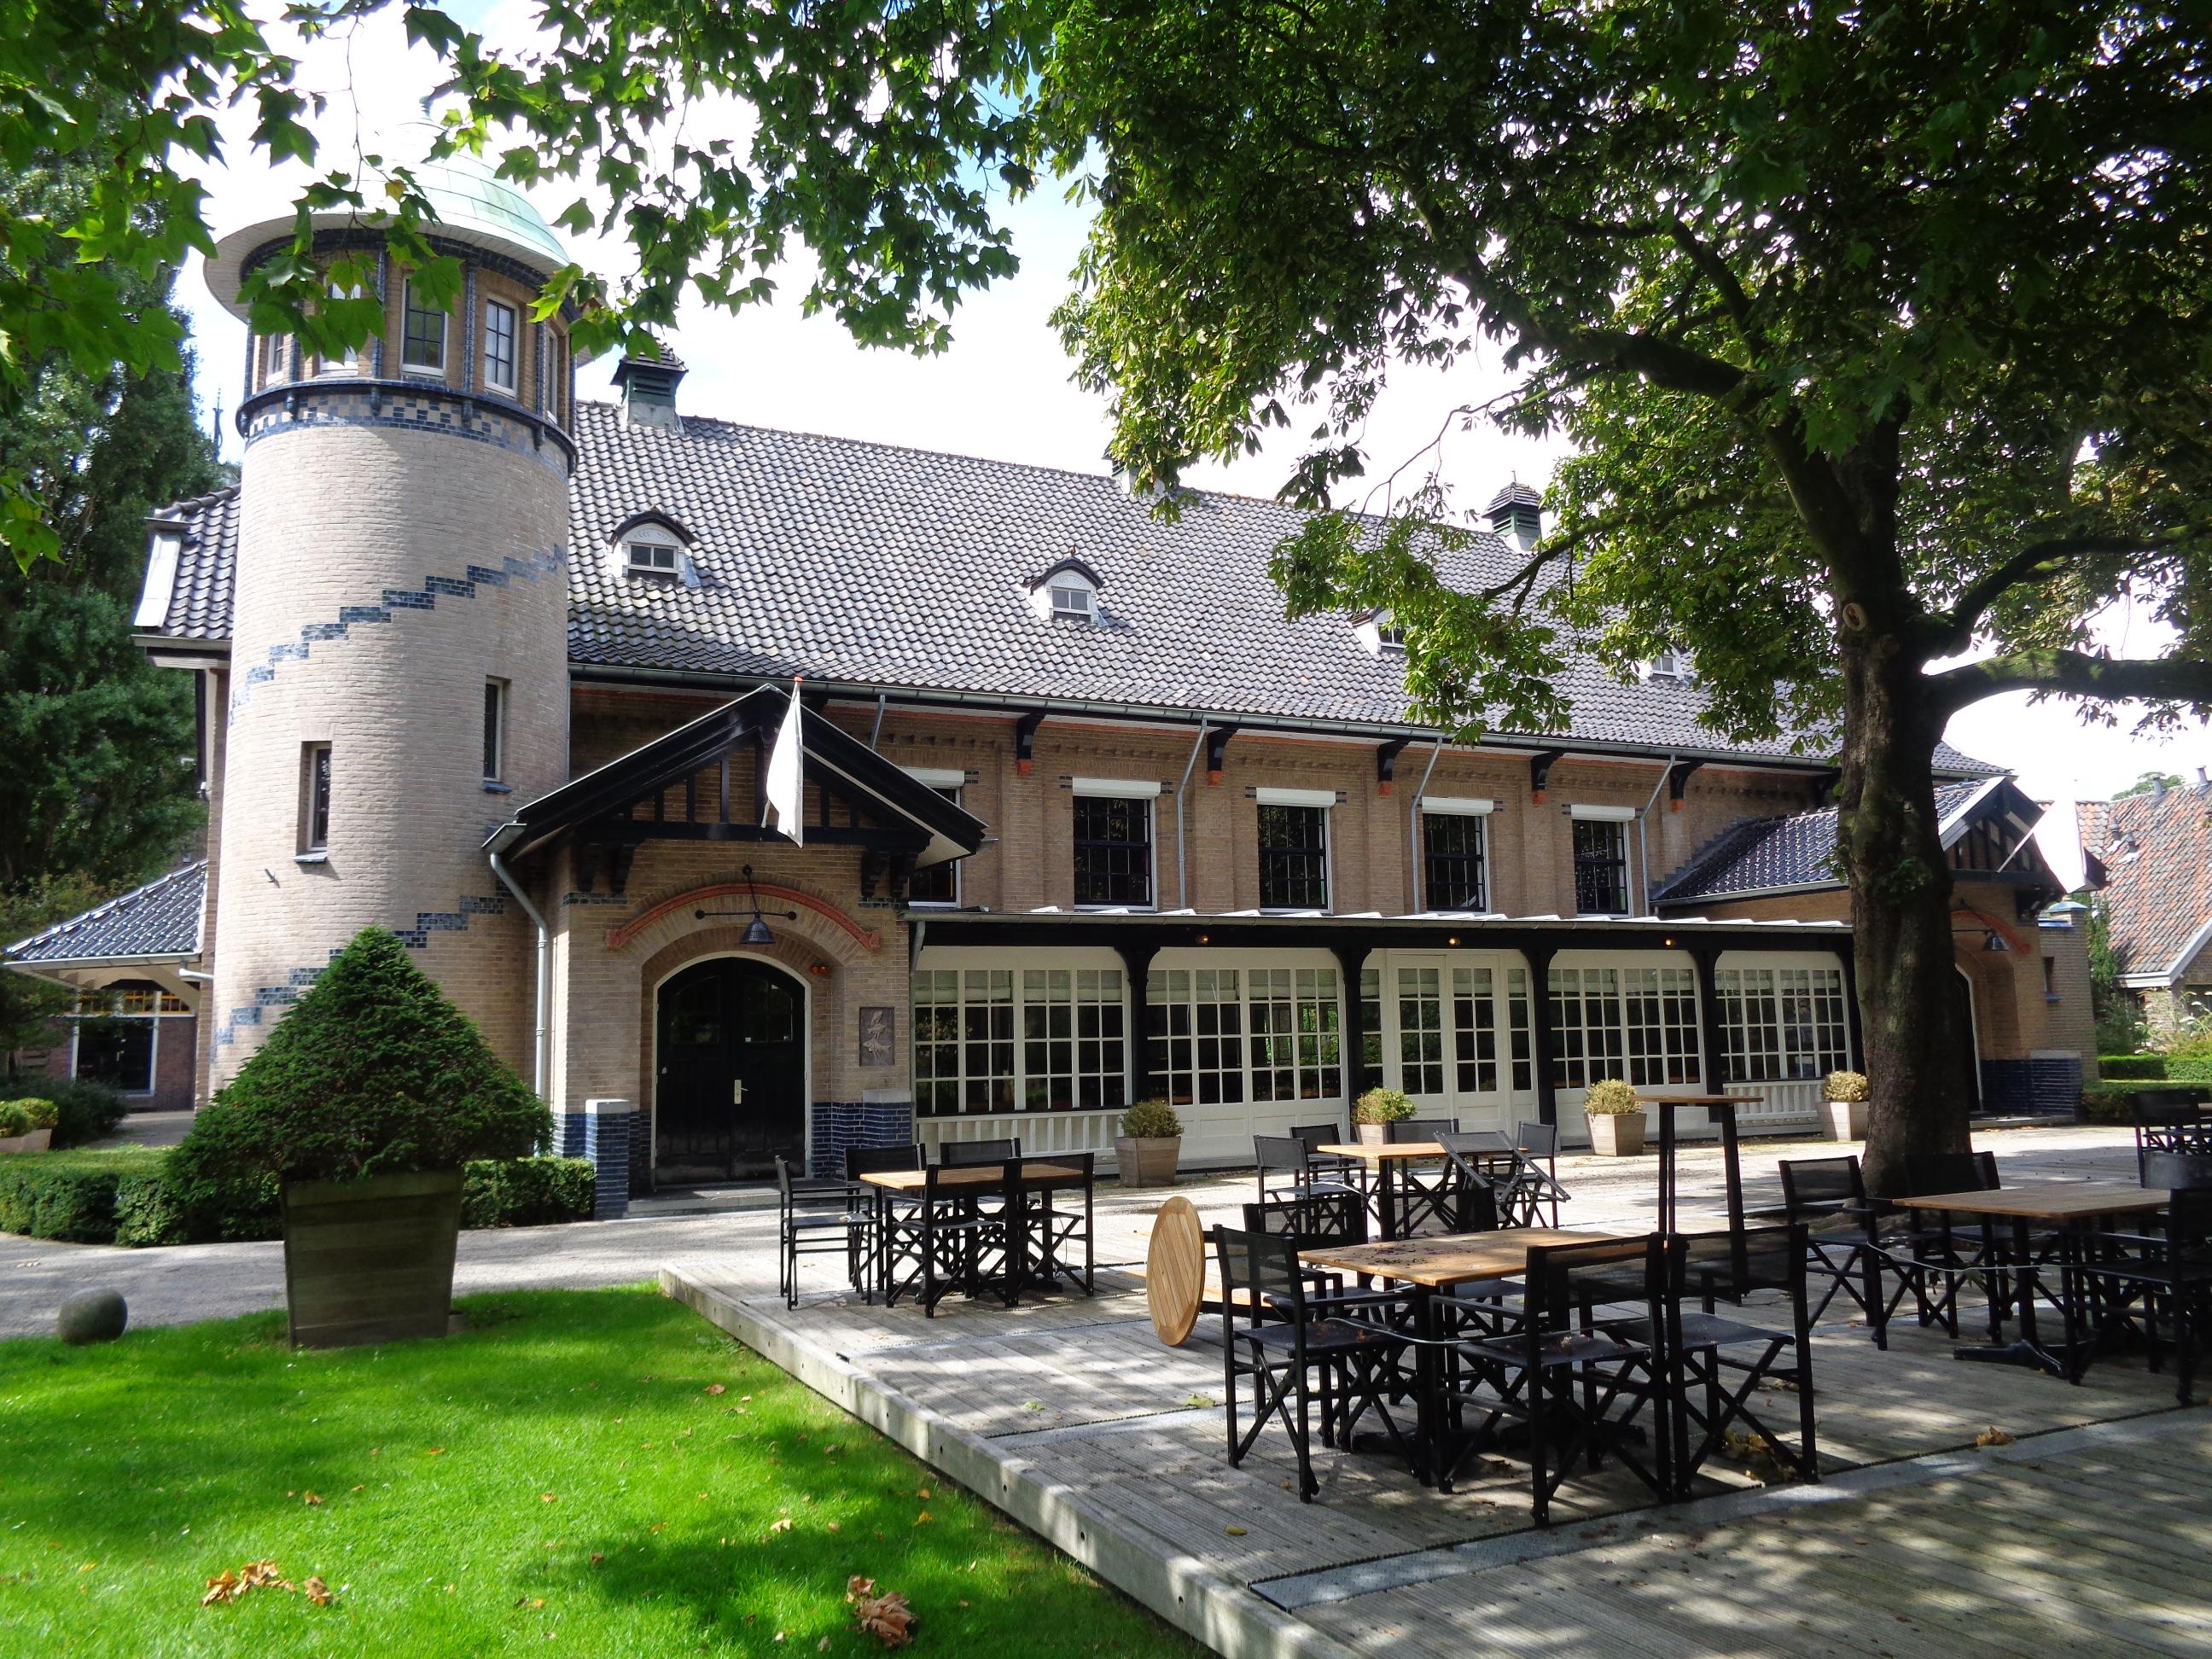 Delft (7)